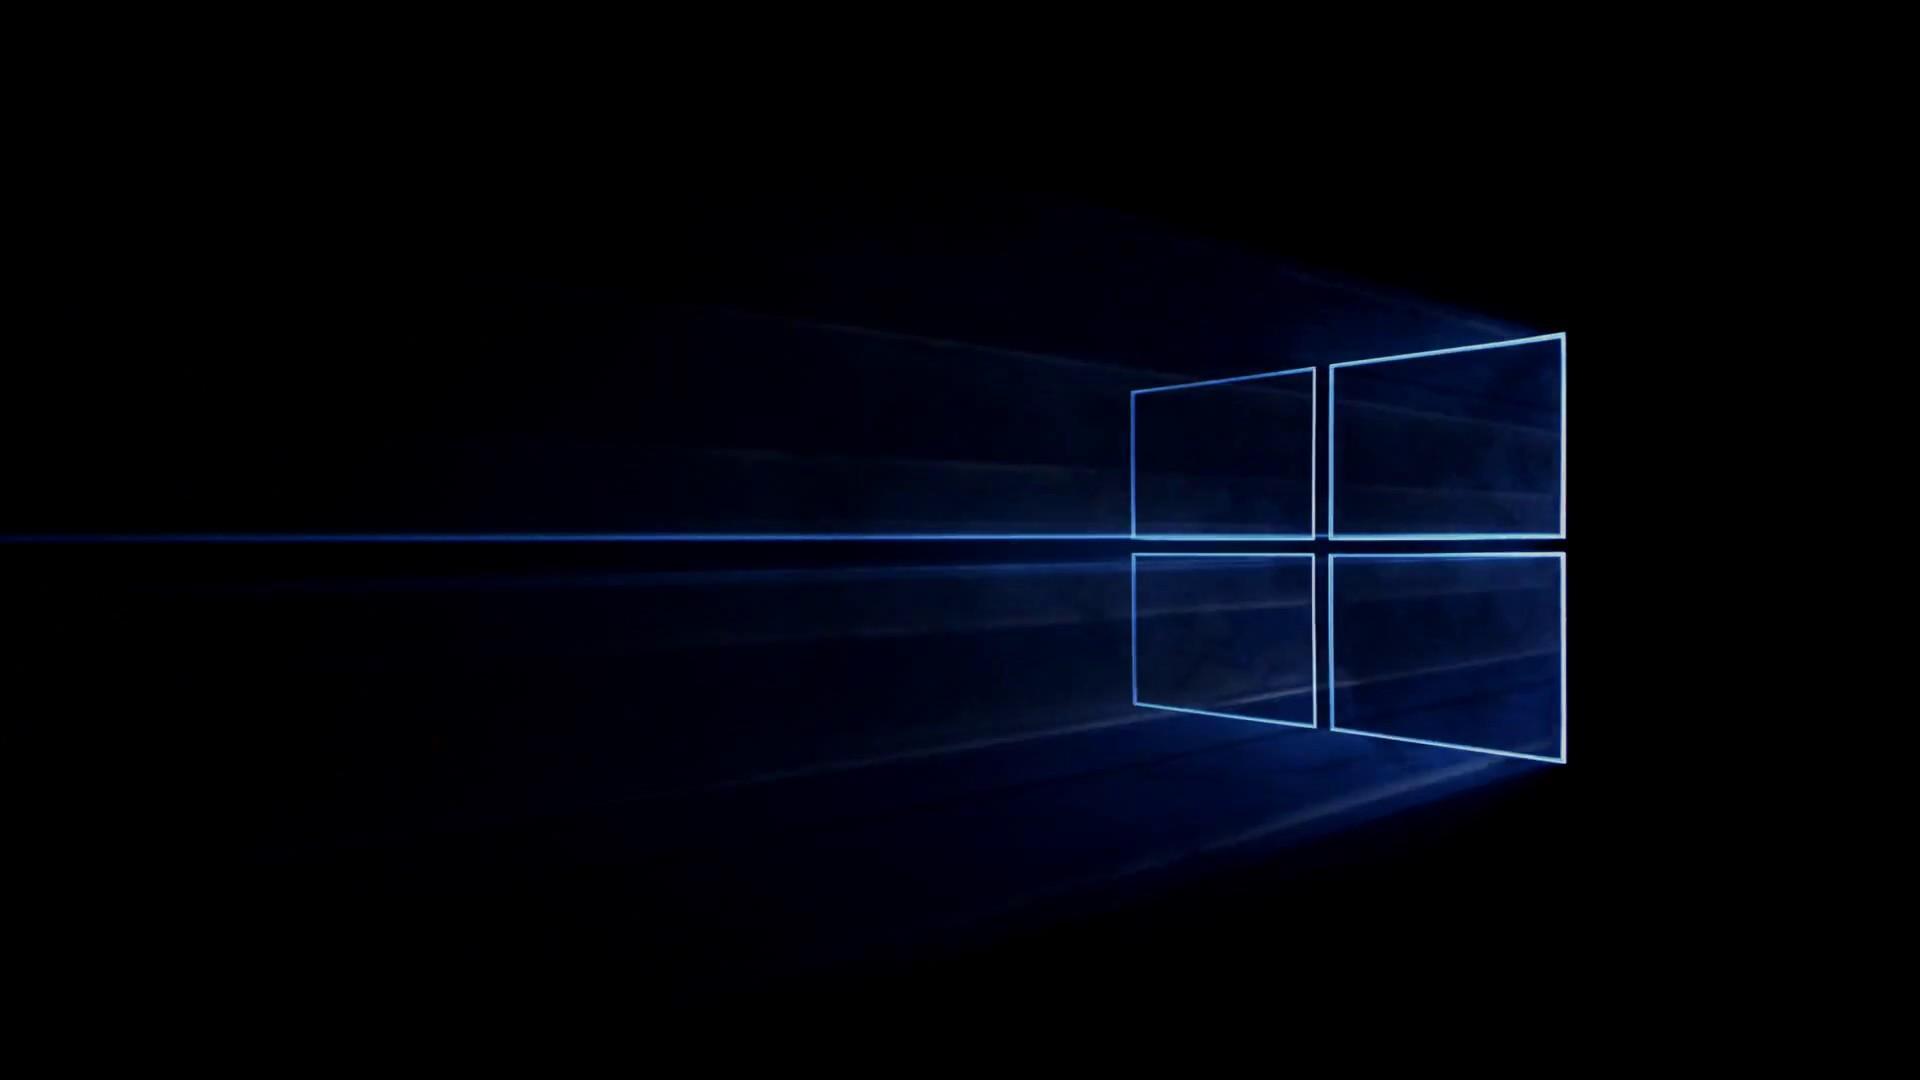 Cool Desktop Wallpapers For Windows 10